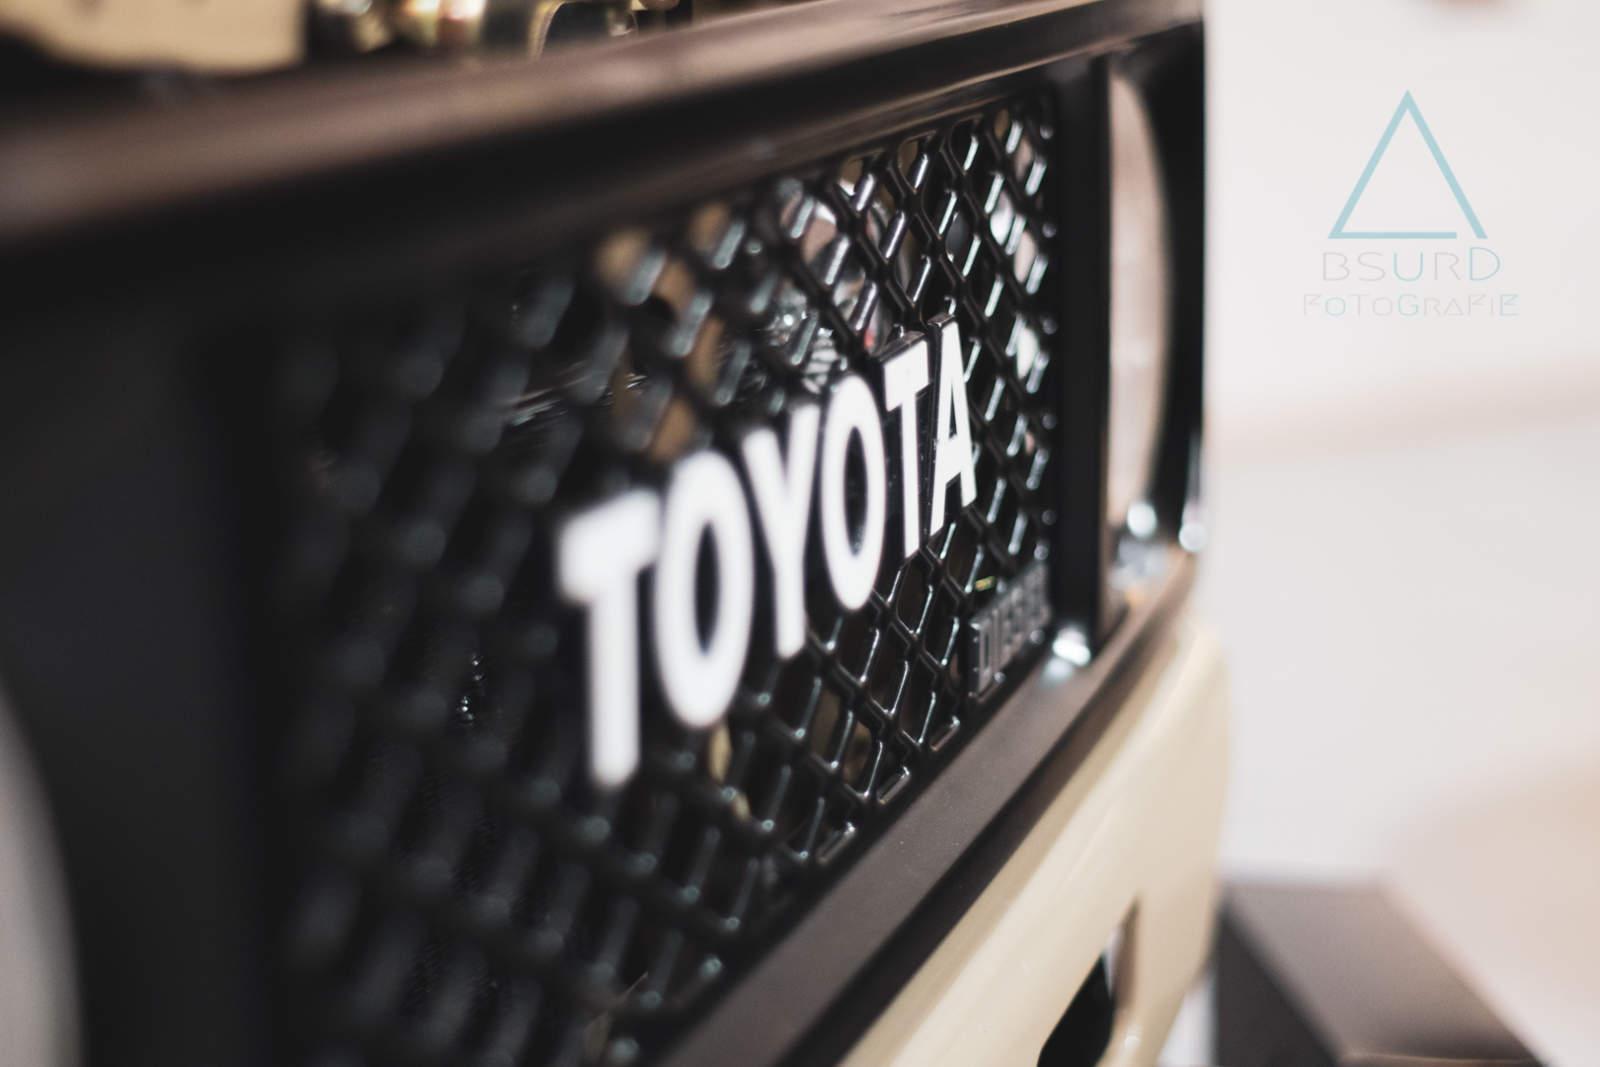 2019-01-05-Toyota-Collection-Koeln - DSC01676-edit-35.jpg